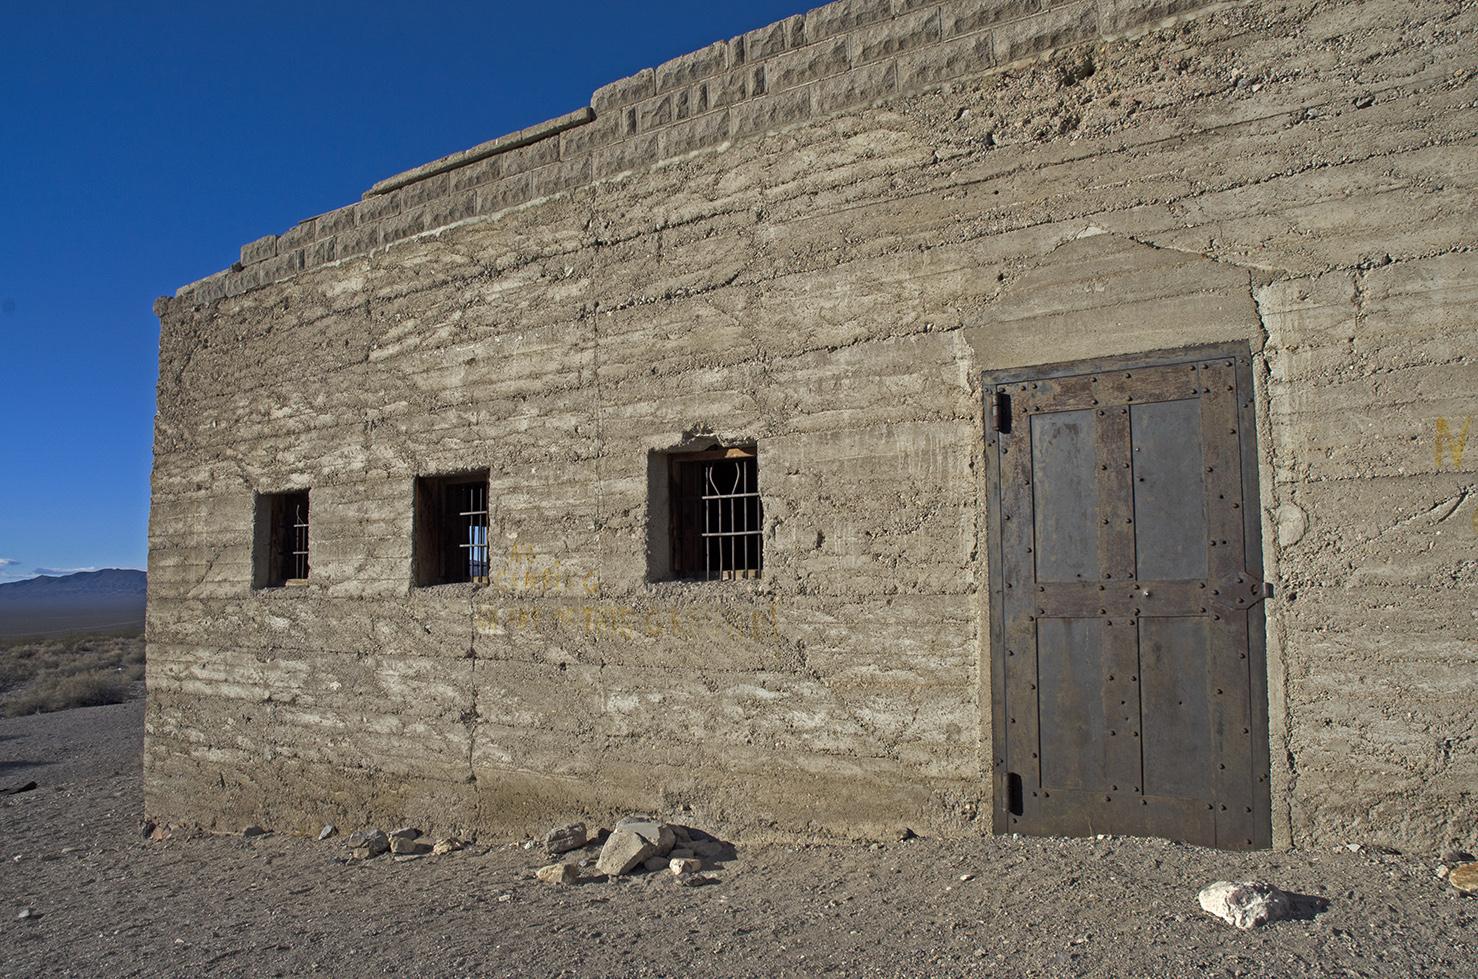 The stone jail still seems pretty formidable.